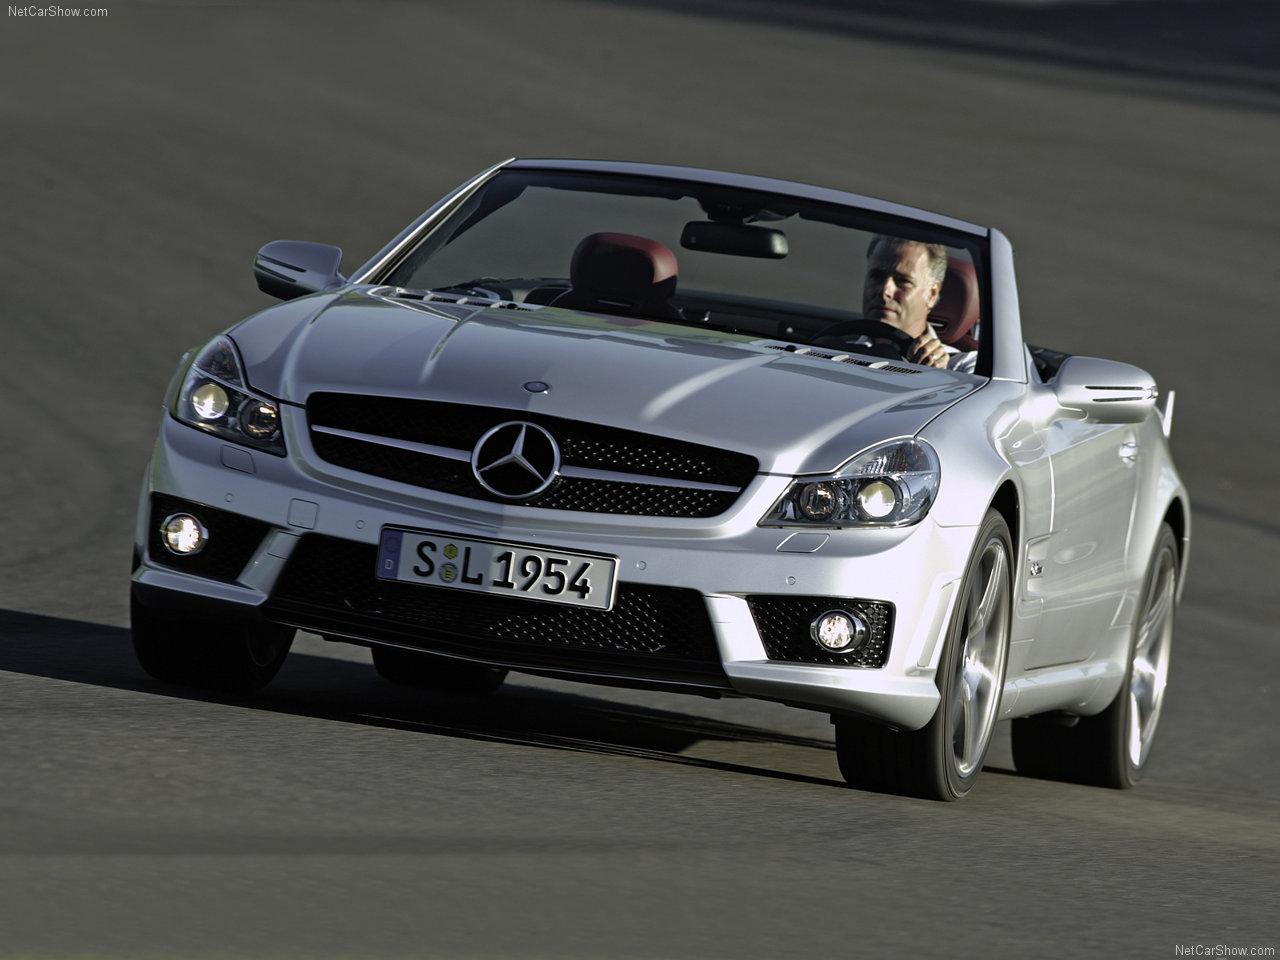 http://3.bp.blogspot.com/-K5r1K4KhN0s/TWoKVX2hETI/AAAAAAACLQY/ce3iu3EsYug/s1600/Mercedes-Benz-SL63_AMG_2009_1280x960_wallpaper_08.jpg